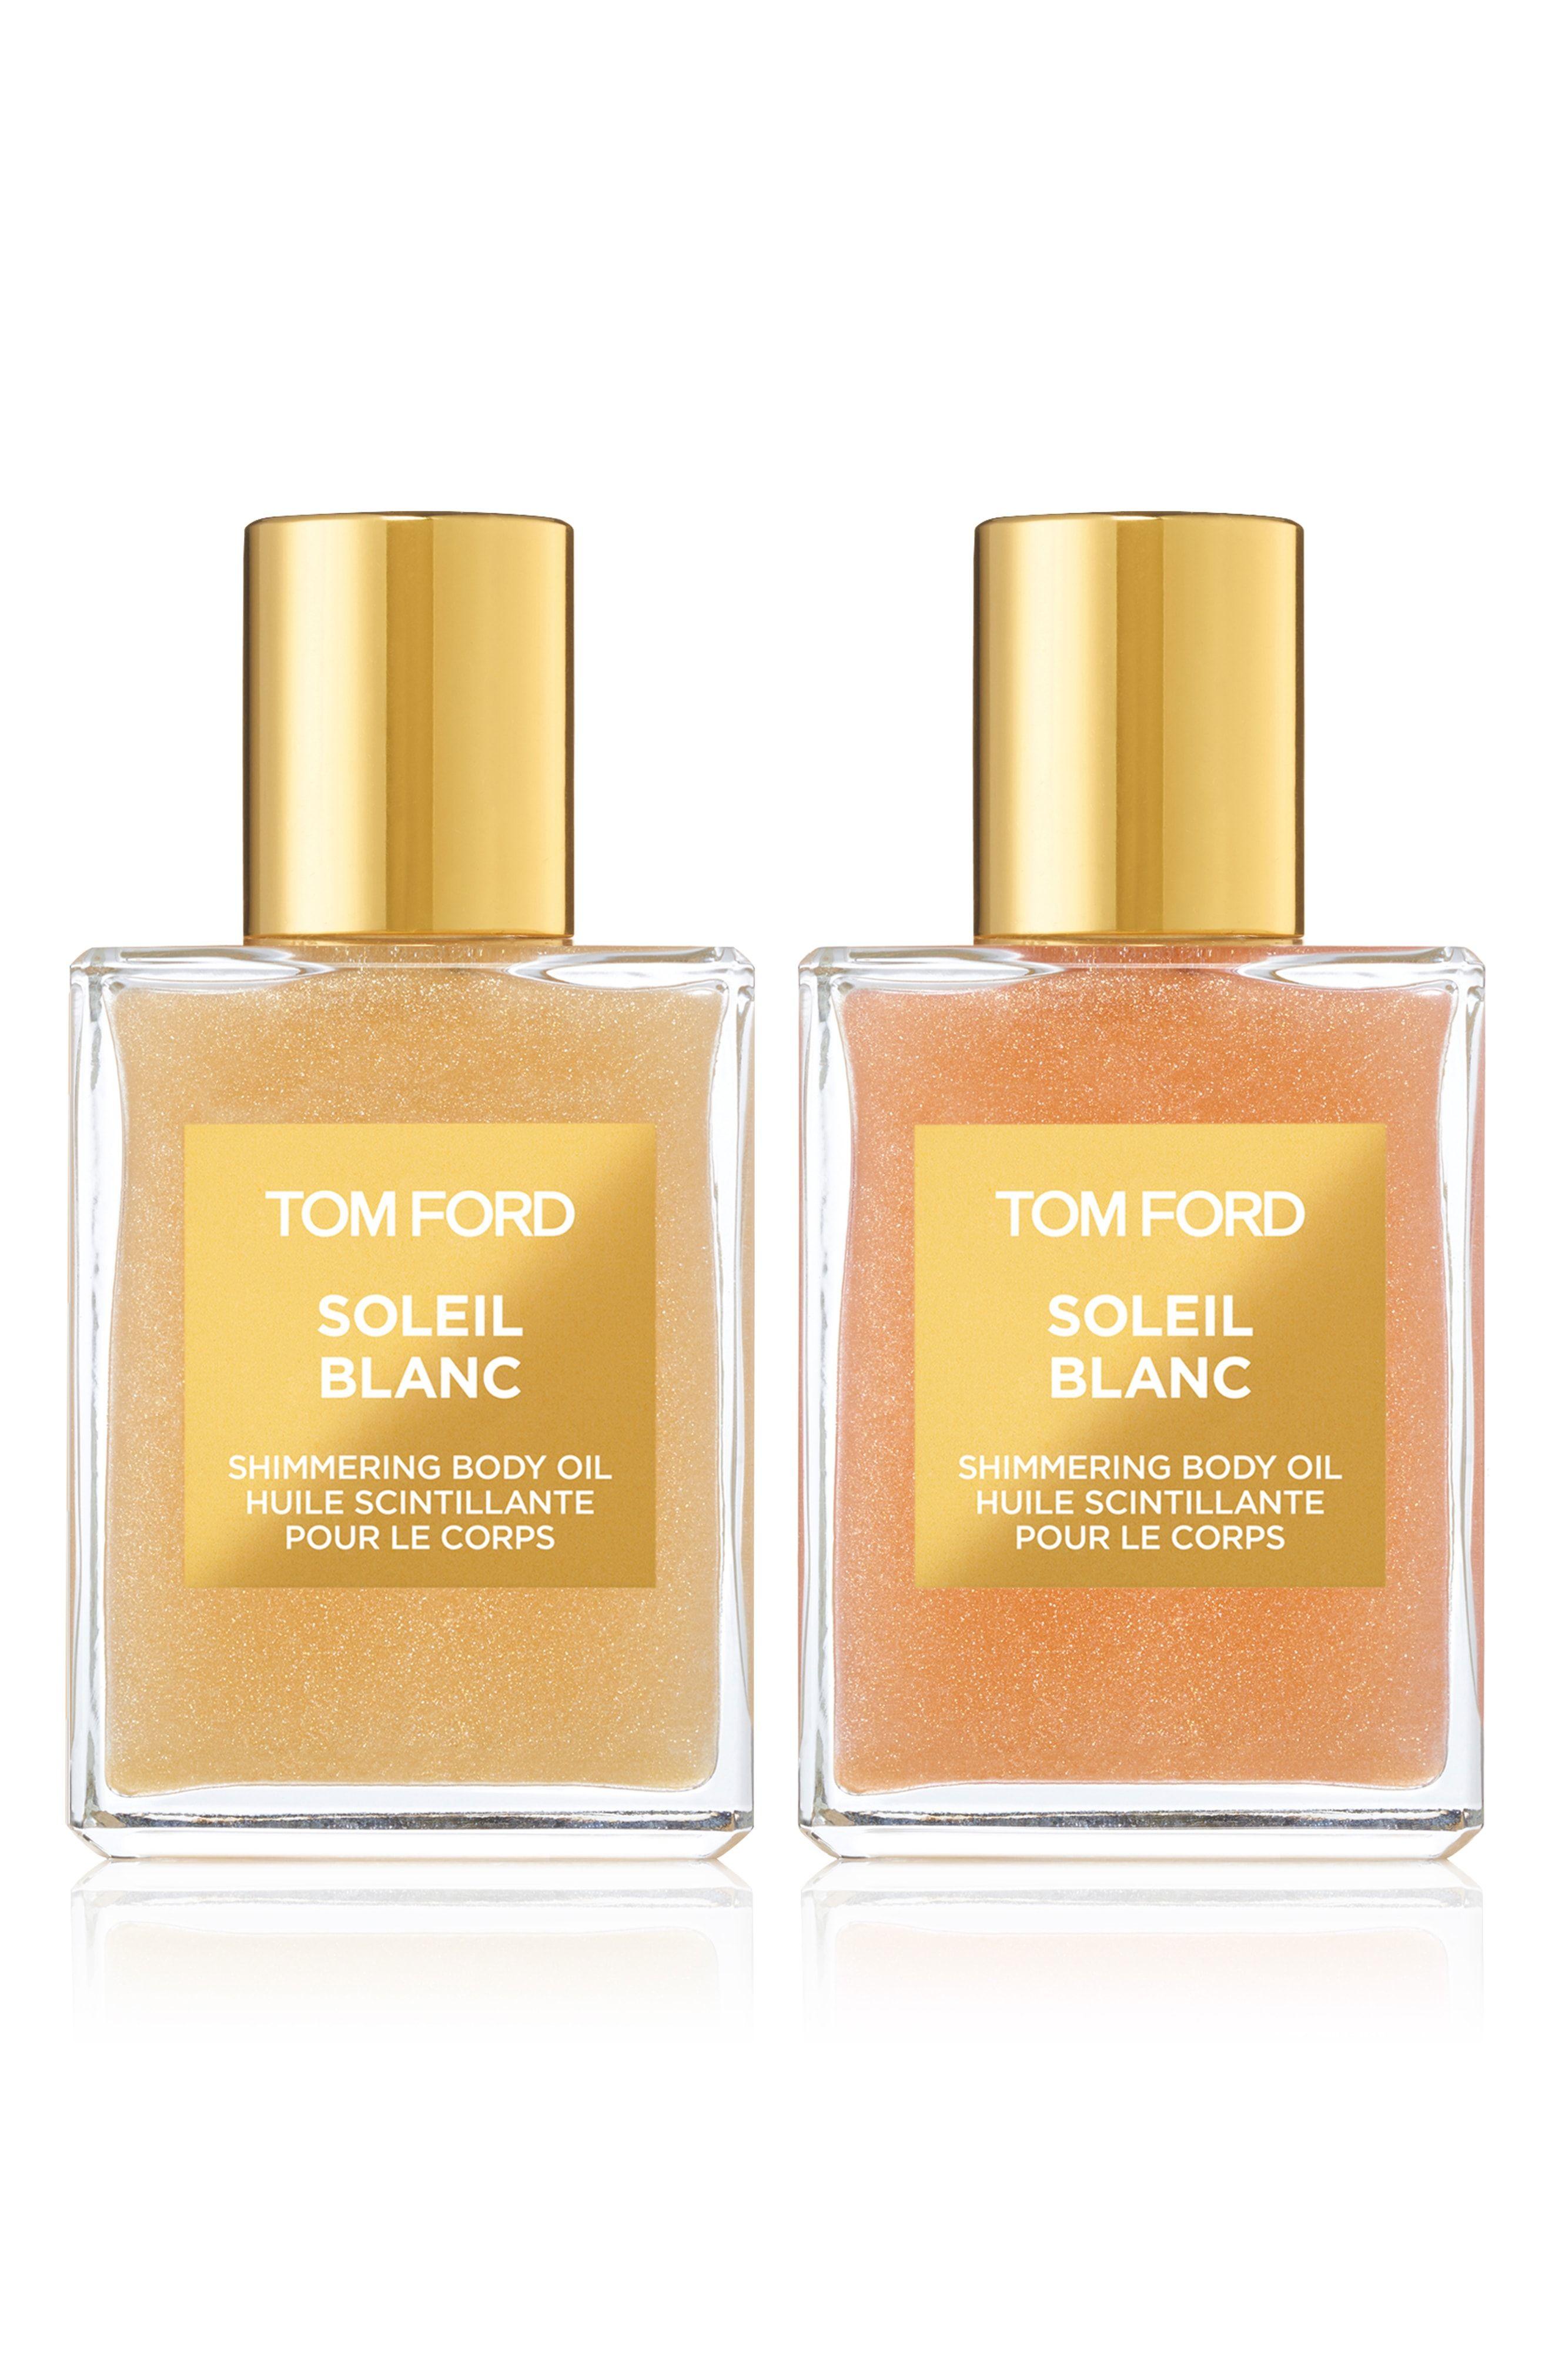 937f32ce28 Tom Ford Mini Soleil Blanc Shimmering Body Oil Set